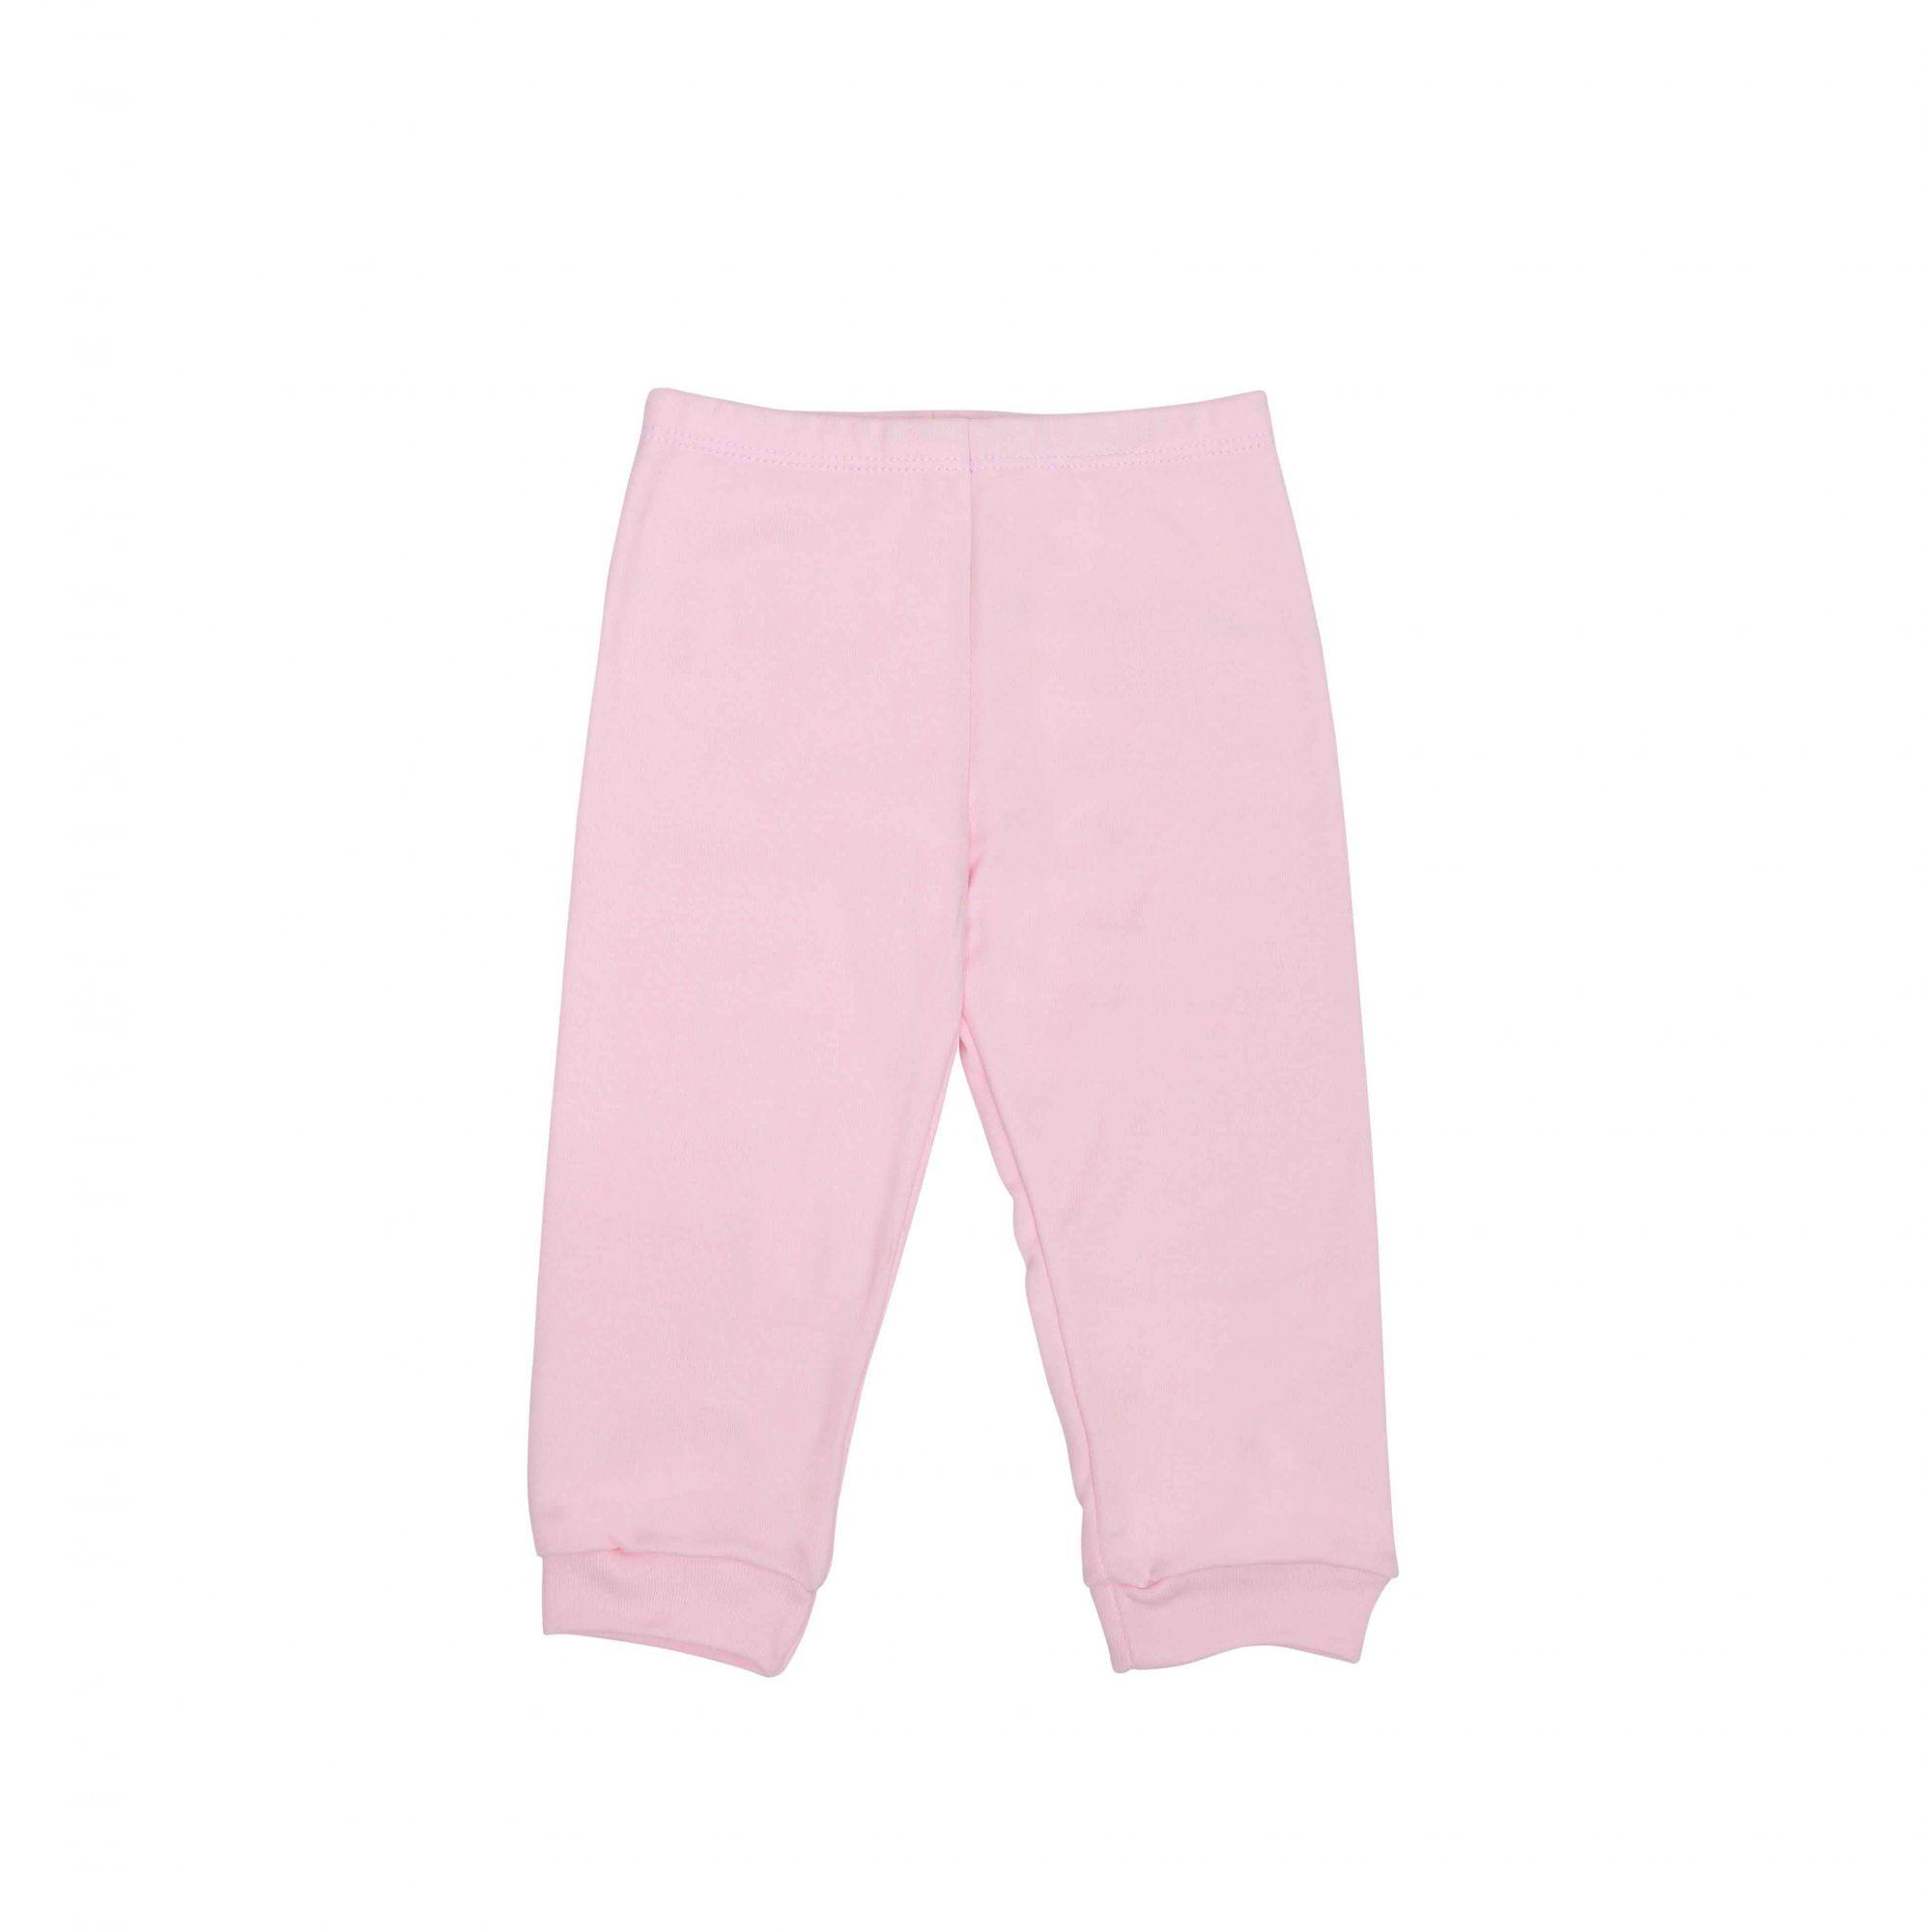 Kit Pijama Body Manga Curta e Calça Rosa